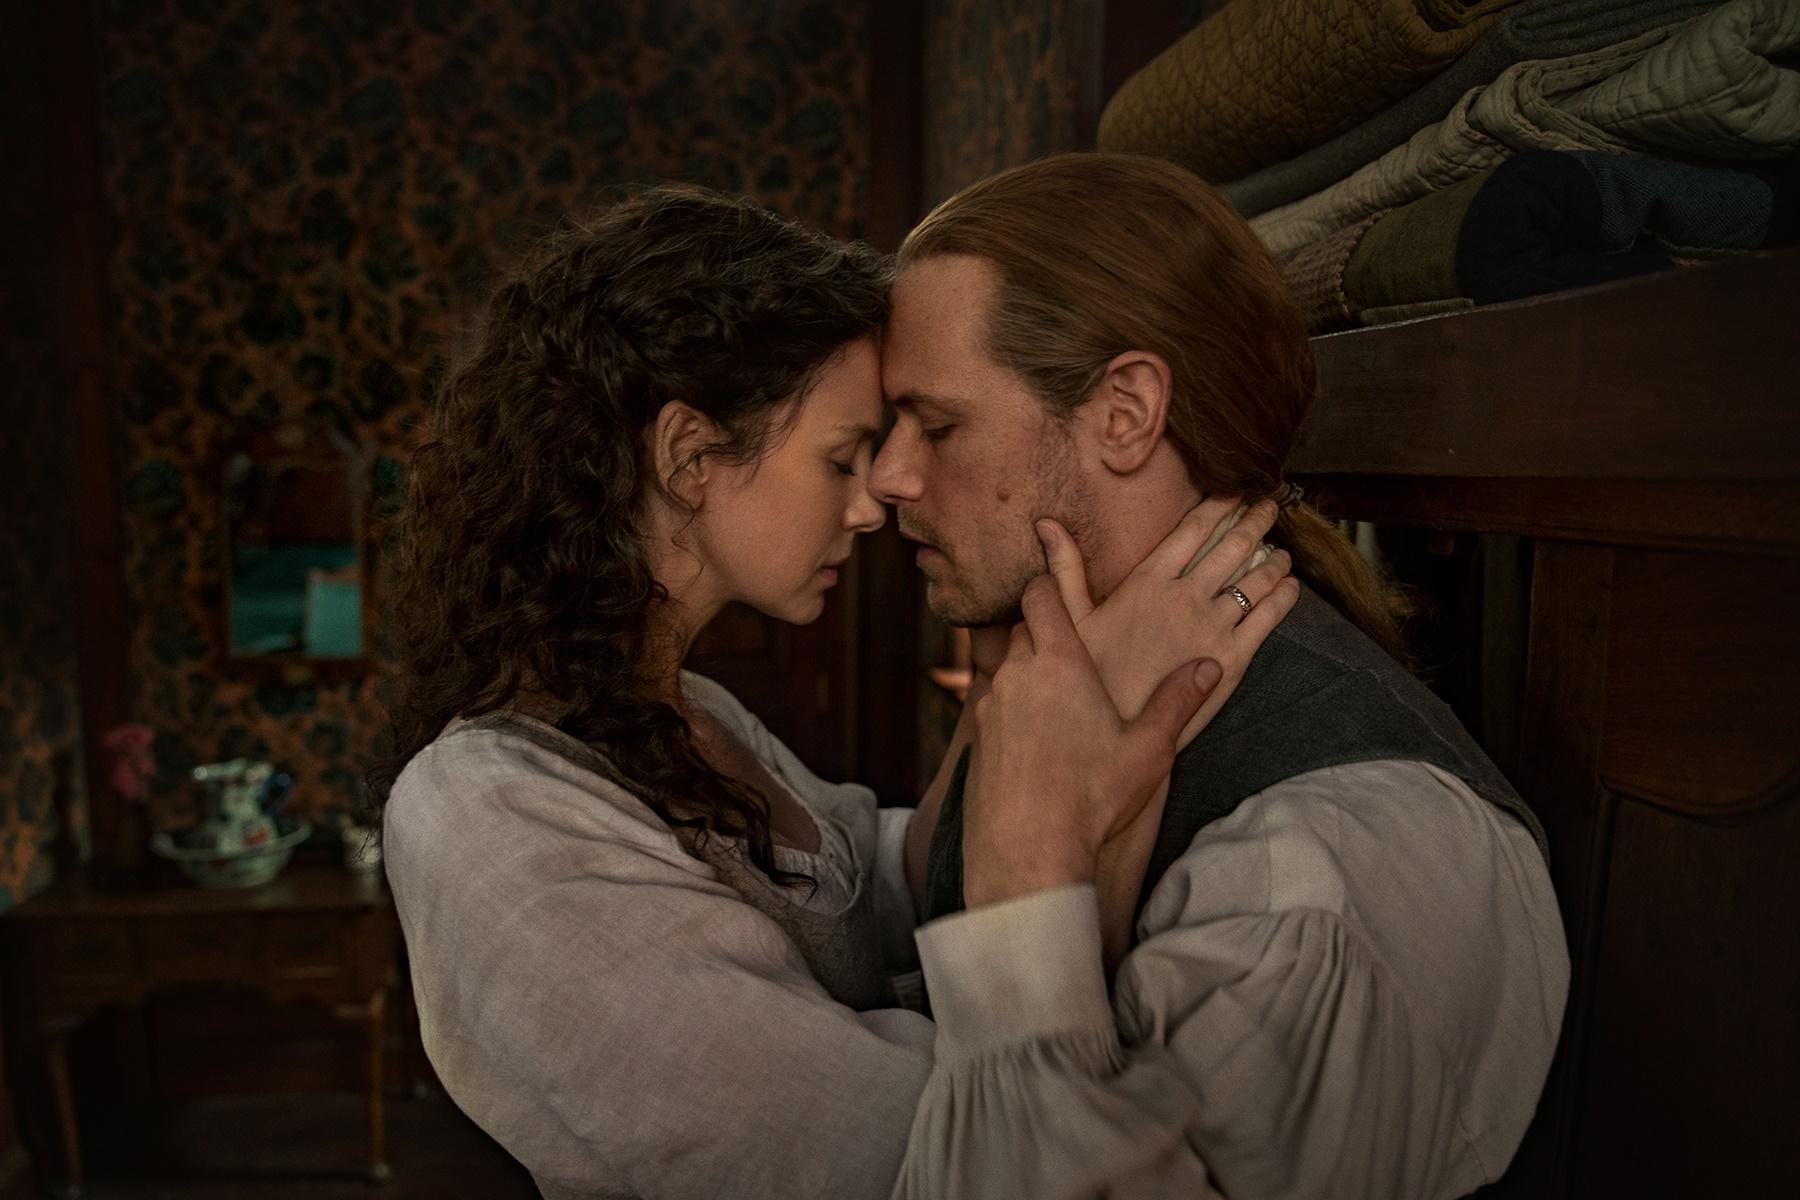 Outlander: Season 4-6 Stills + Behind the Scenes Additions